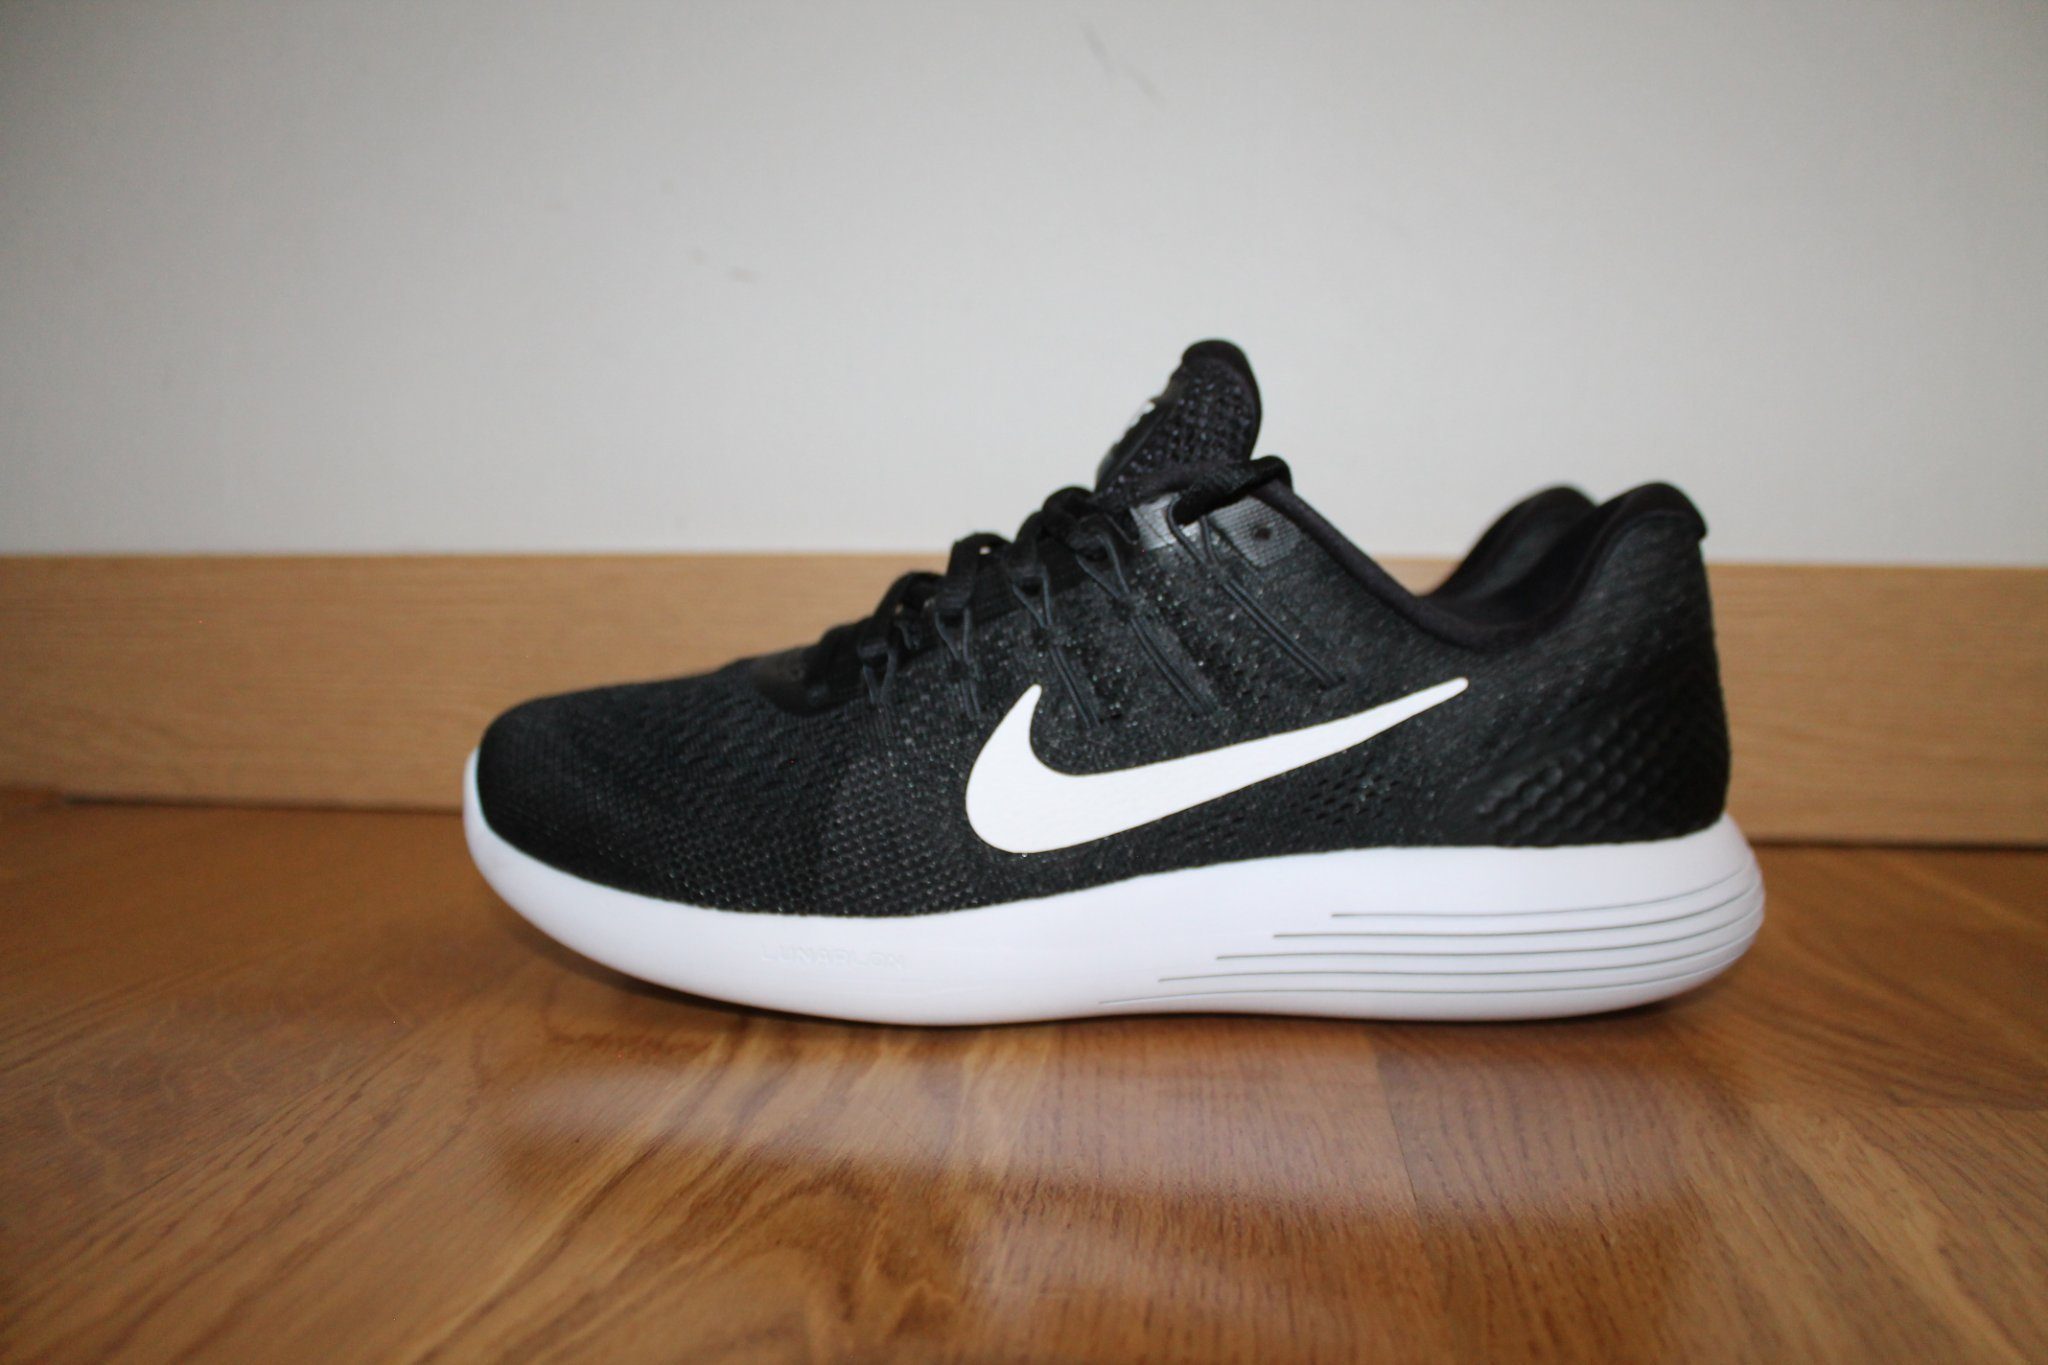 Nike Lunarglide 8 BlackWhite Anthracite